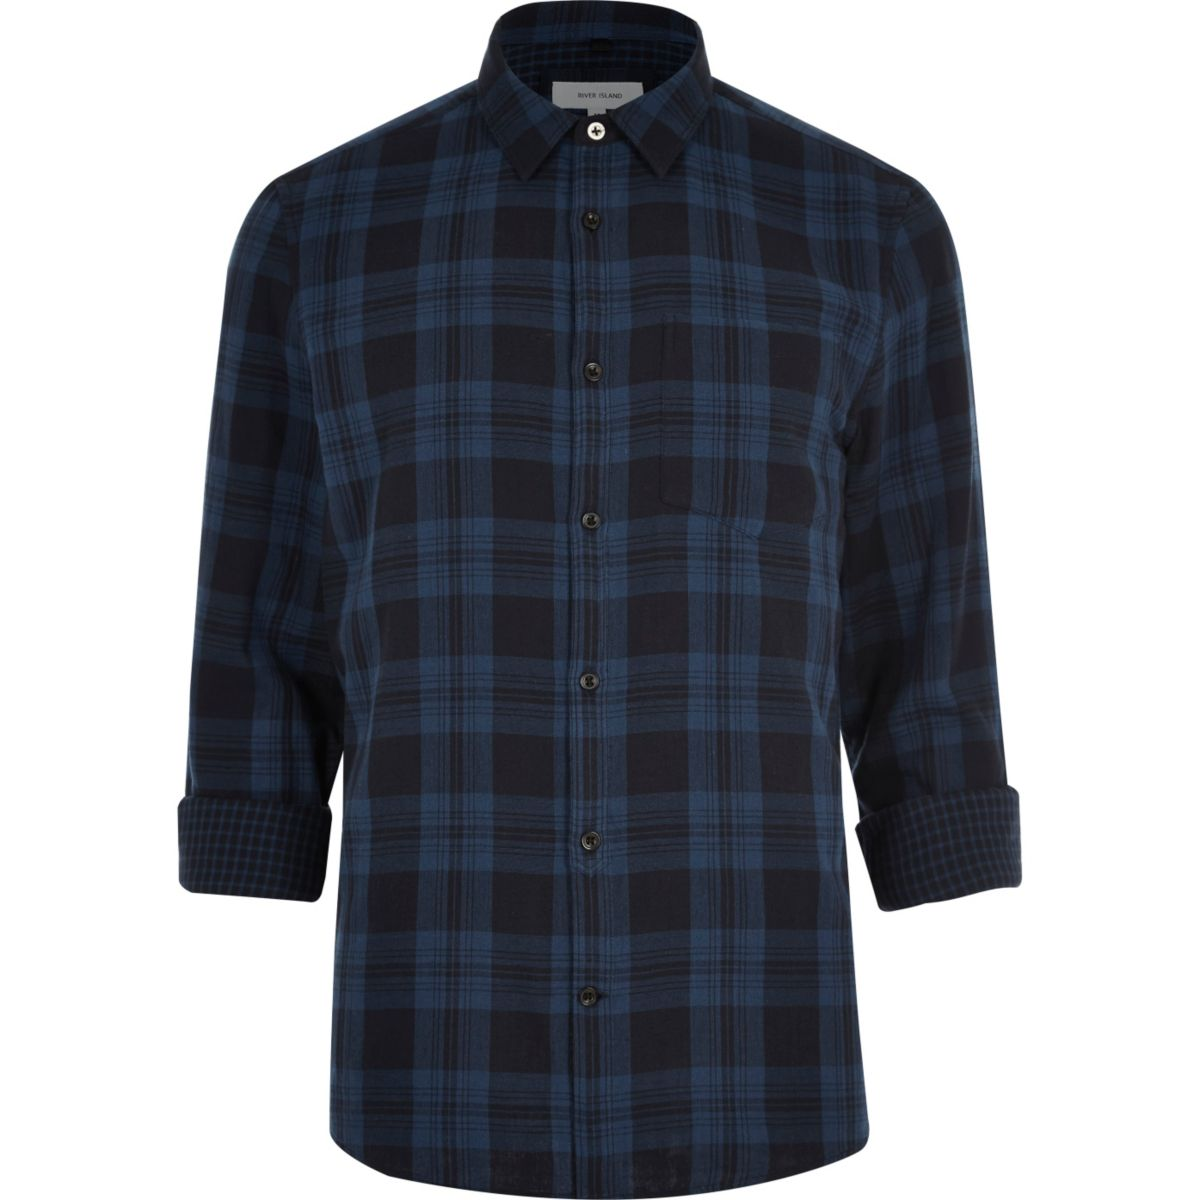 Navy double faced casual check shirt